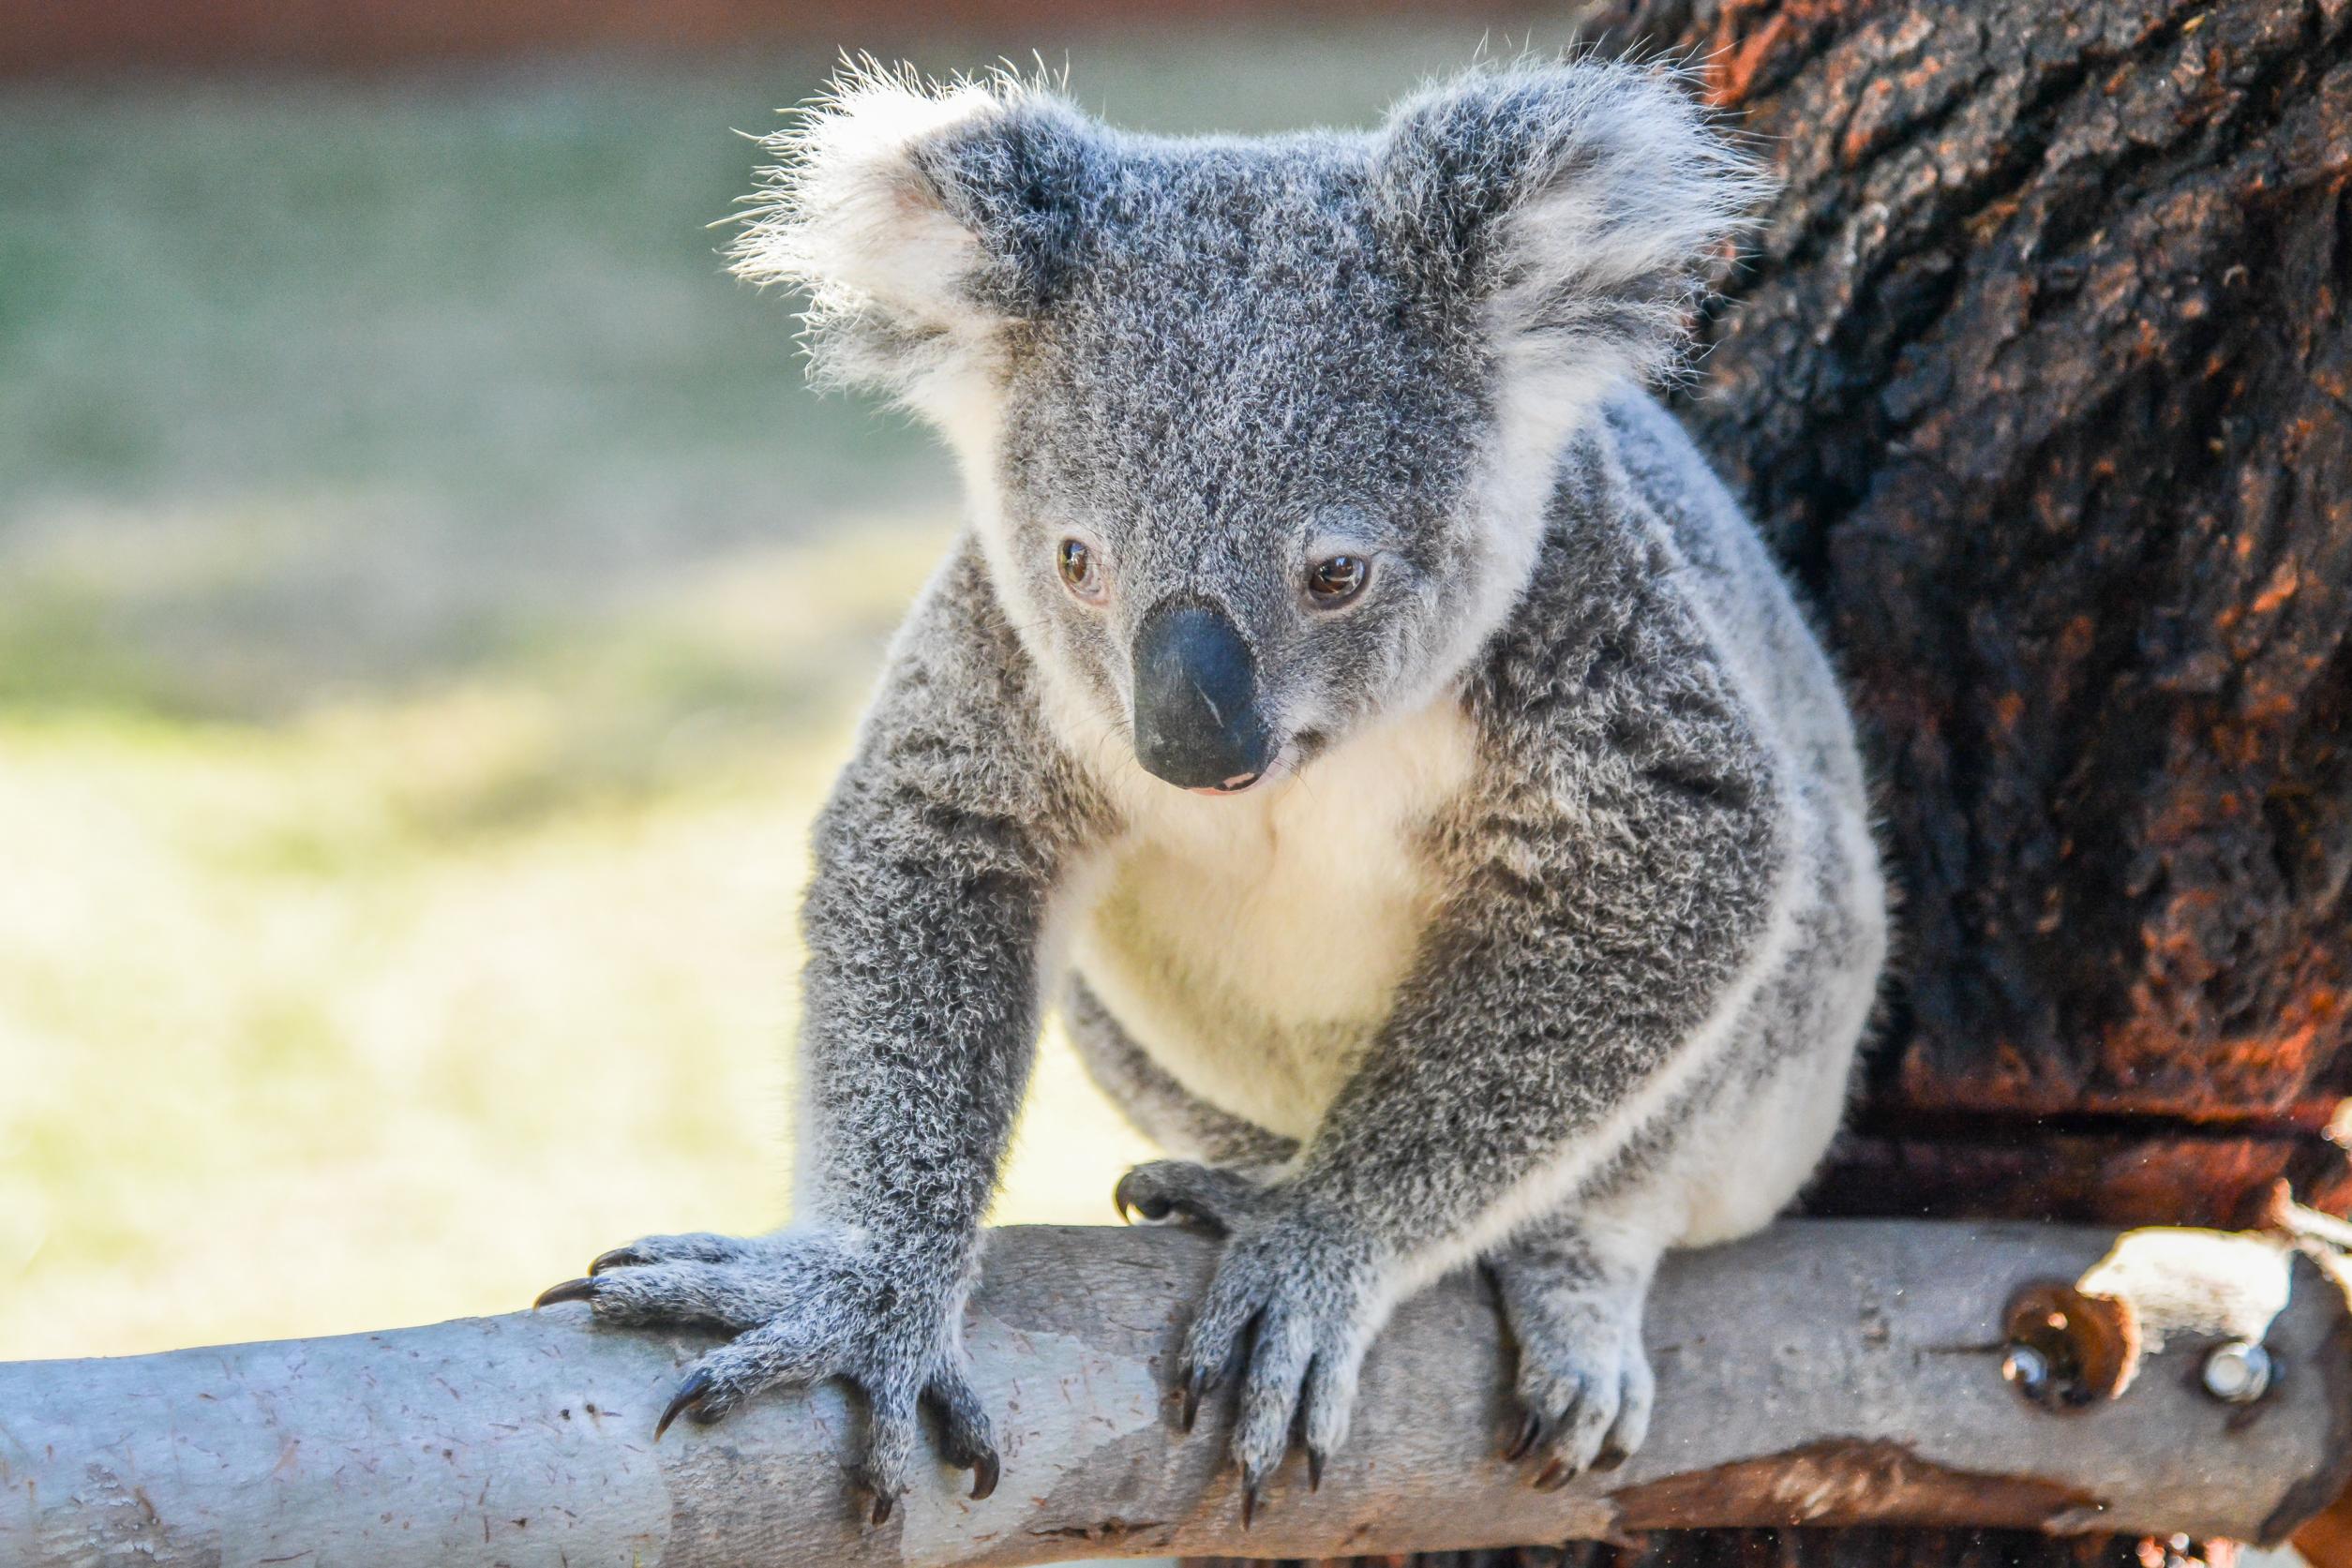 Summer Program - Wildlife Conservation   CIEE High School Summer Abroad: Australian Wildlife Conservation in Perth, Australia